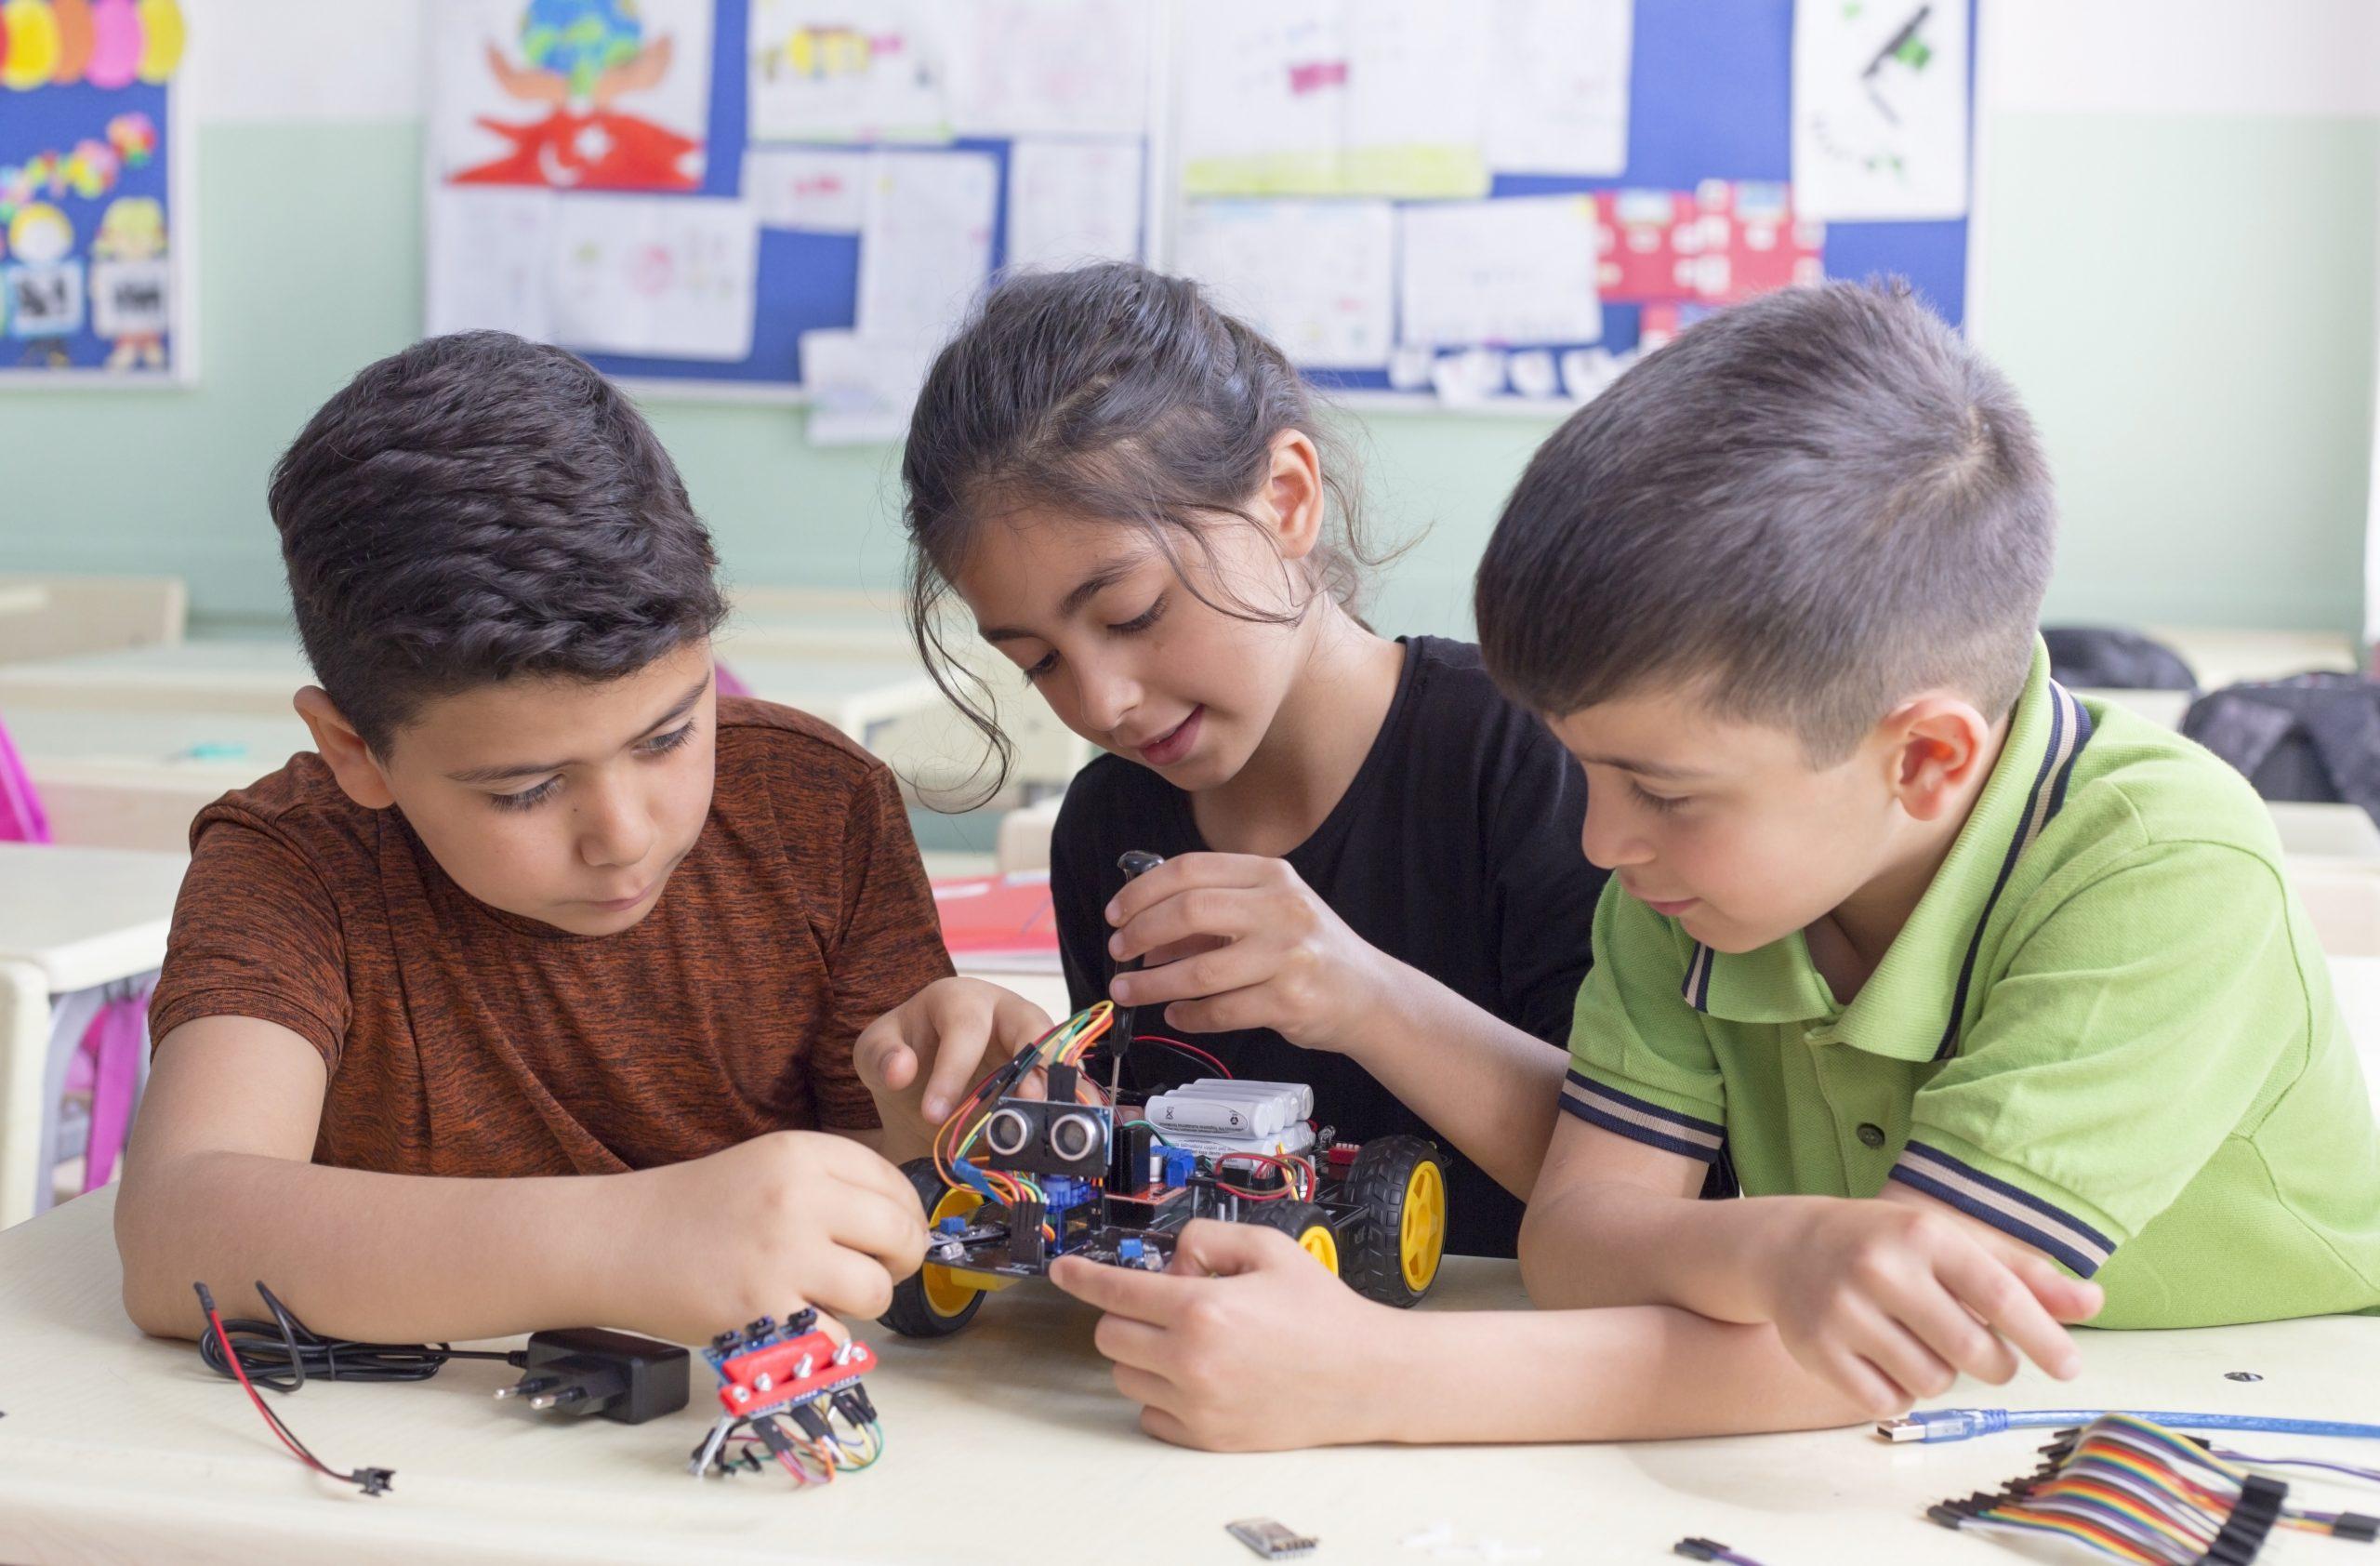 Actividades Extraescolares de Robótica Educativa